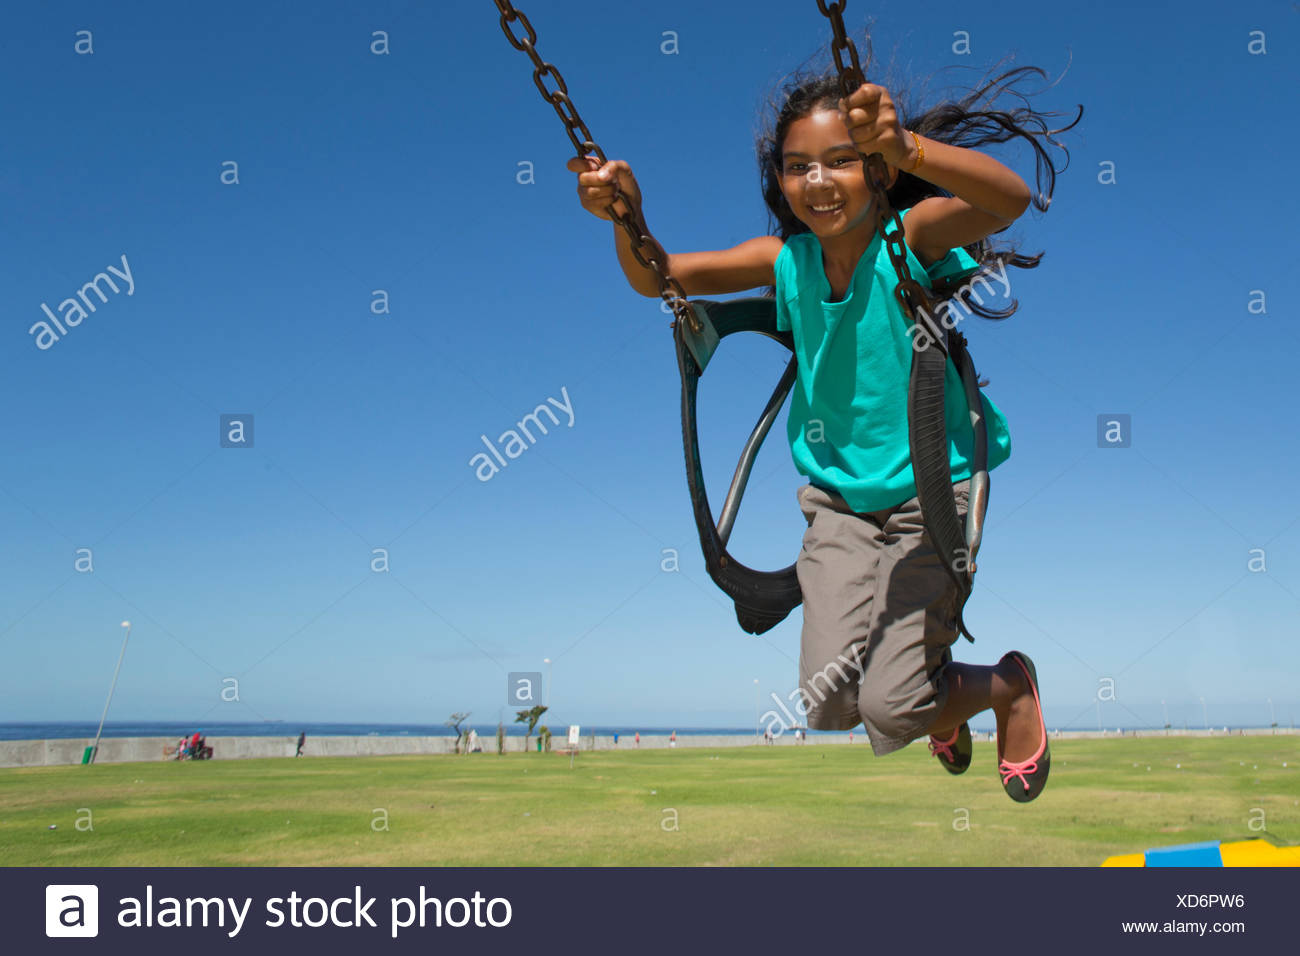 Smiling girl swinging on swing - Stock Image